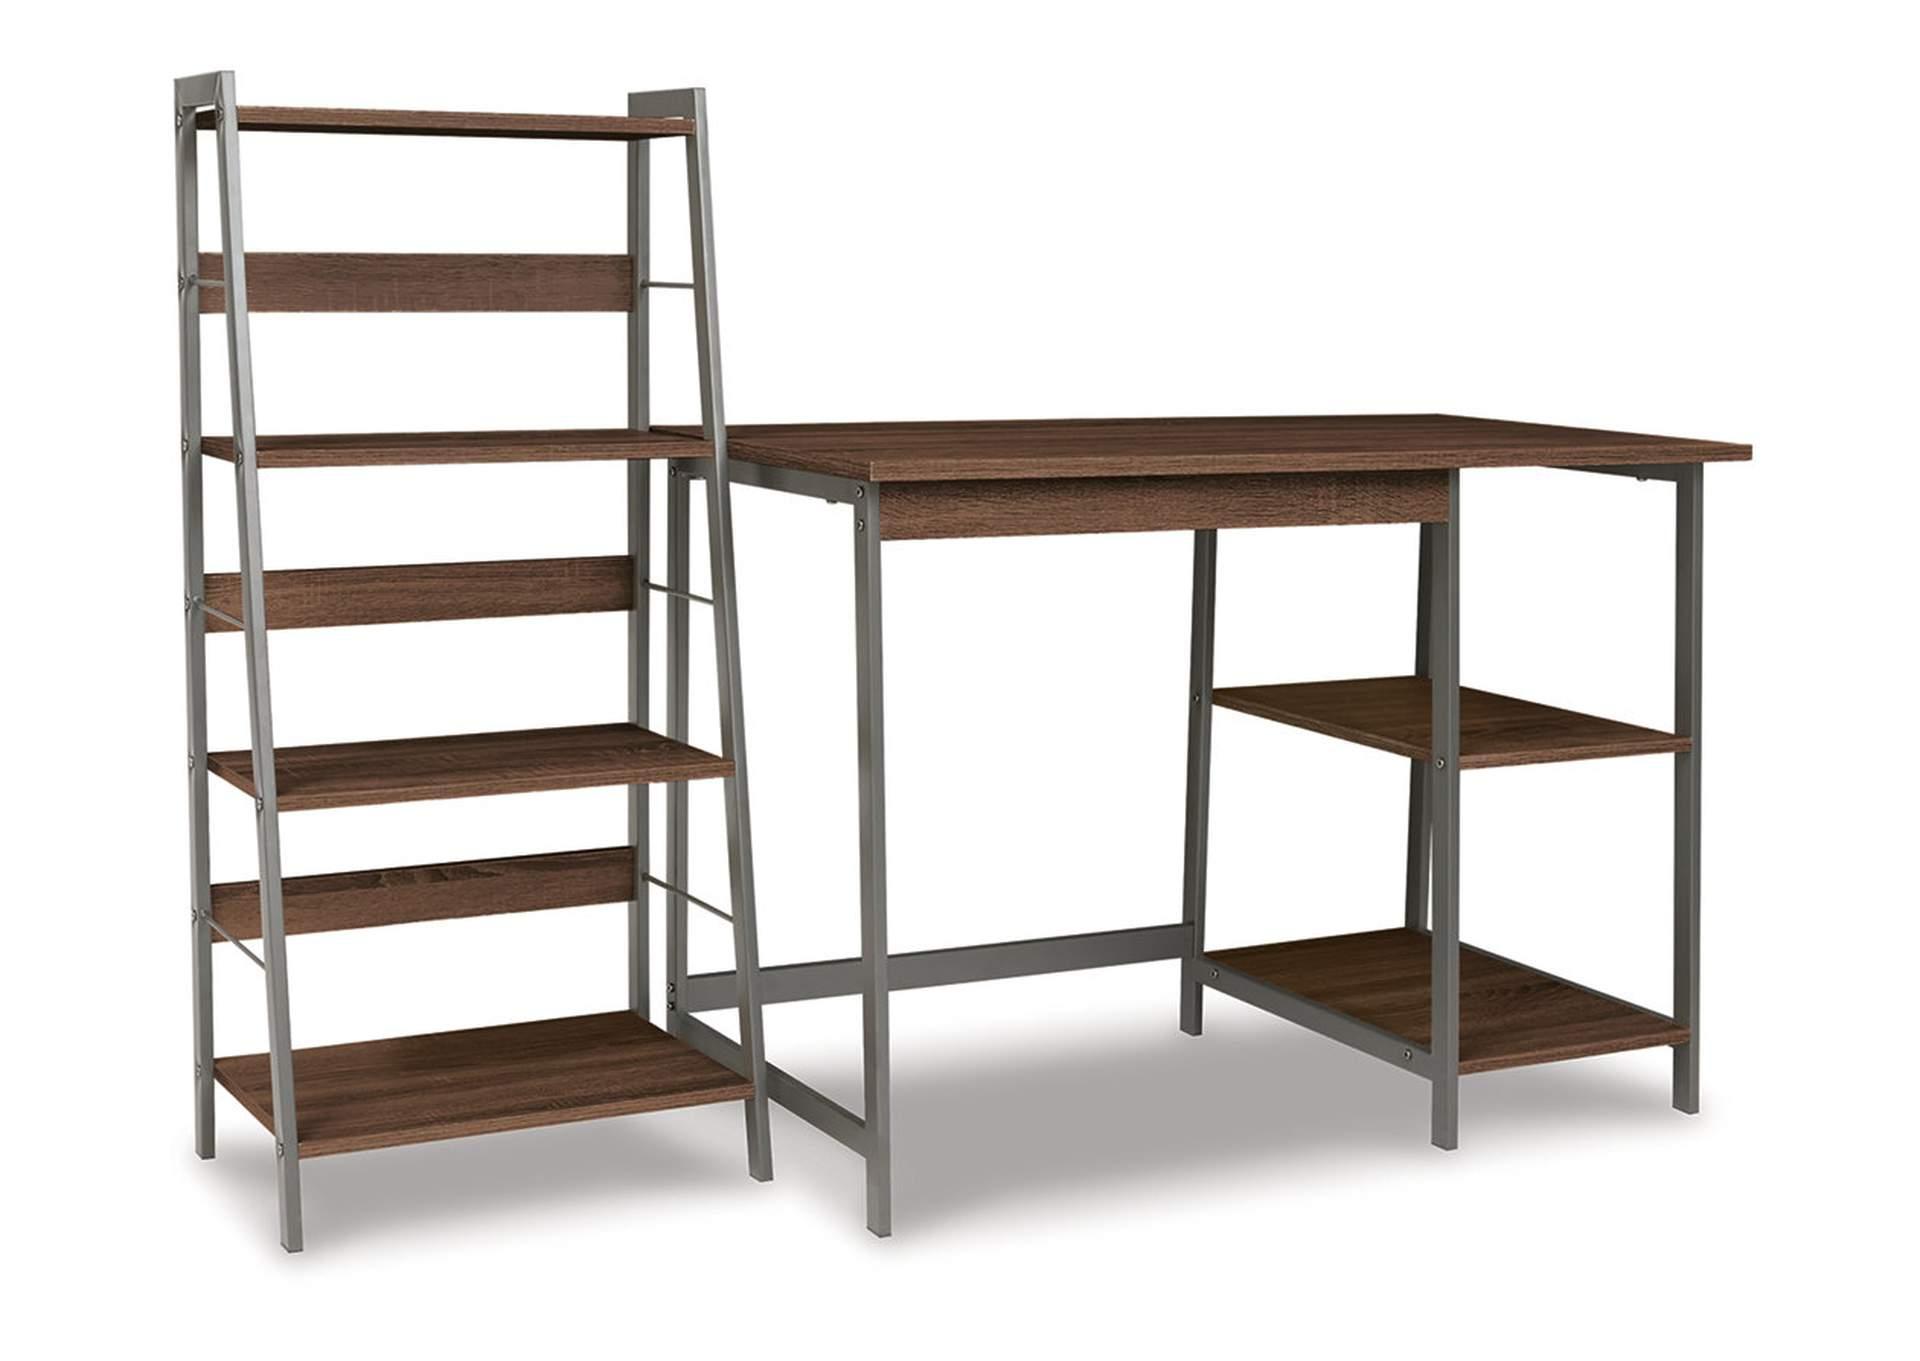 Soho Home Office Desk with Shelf